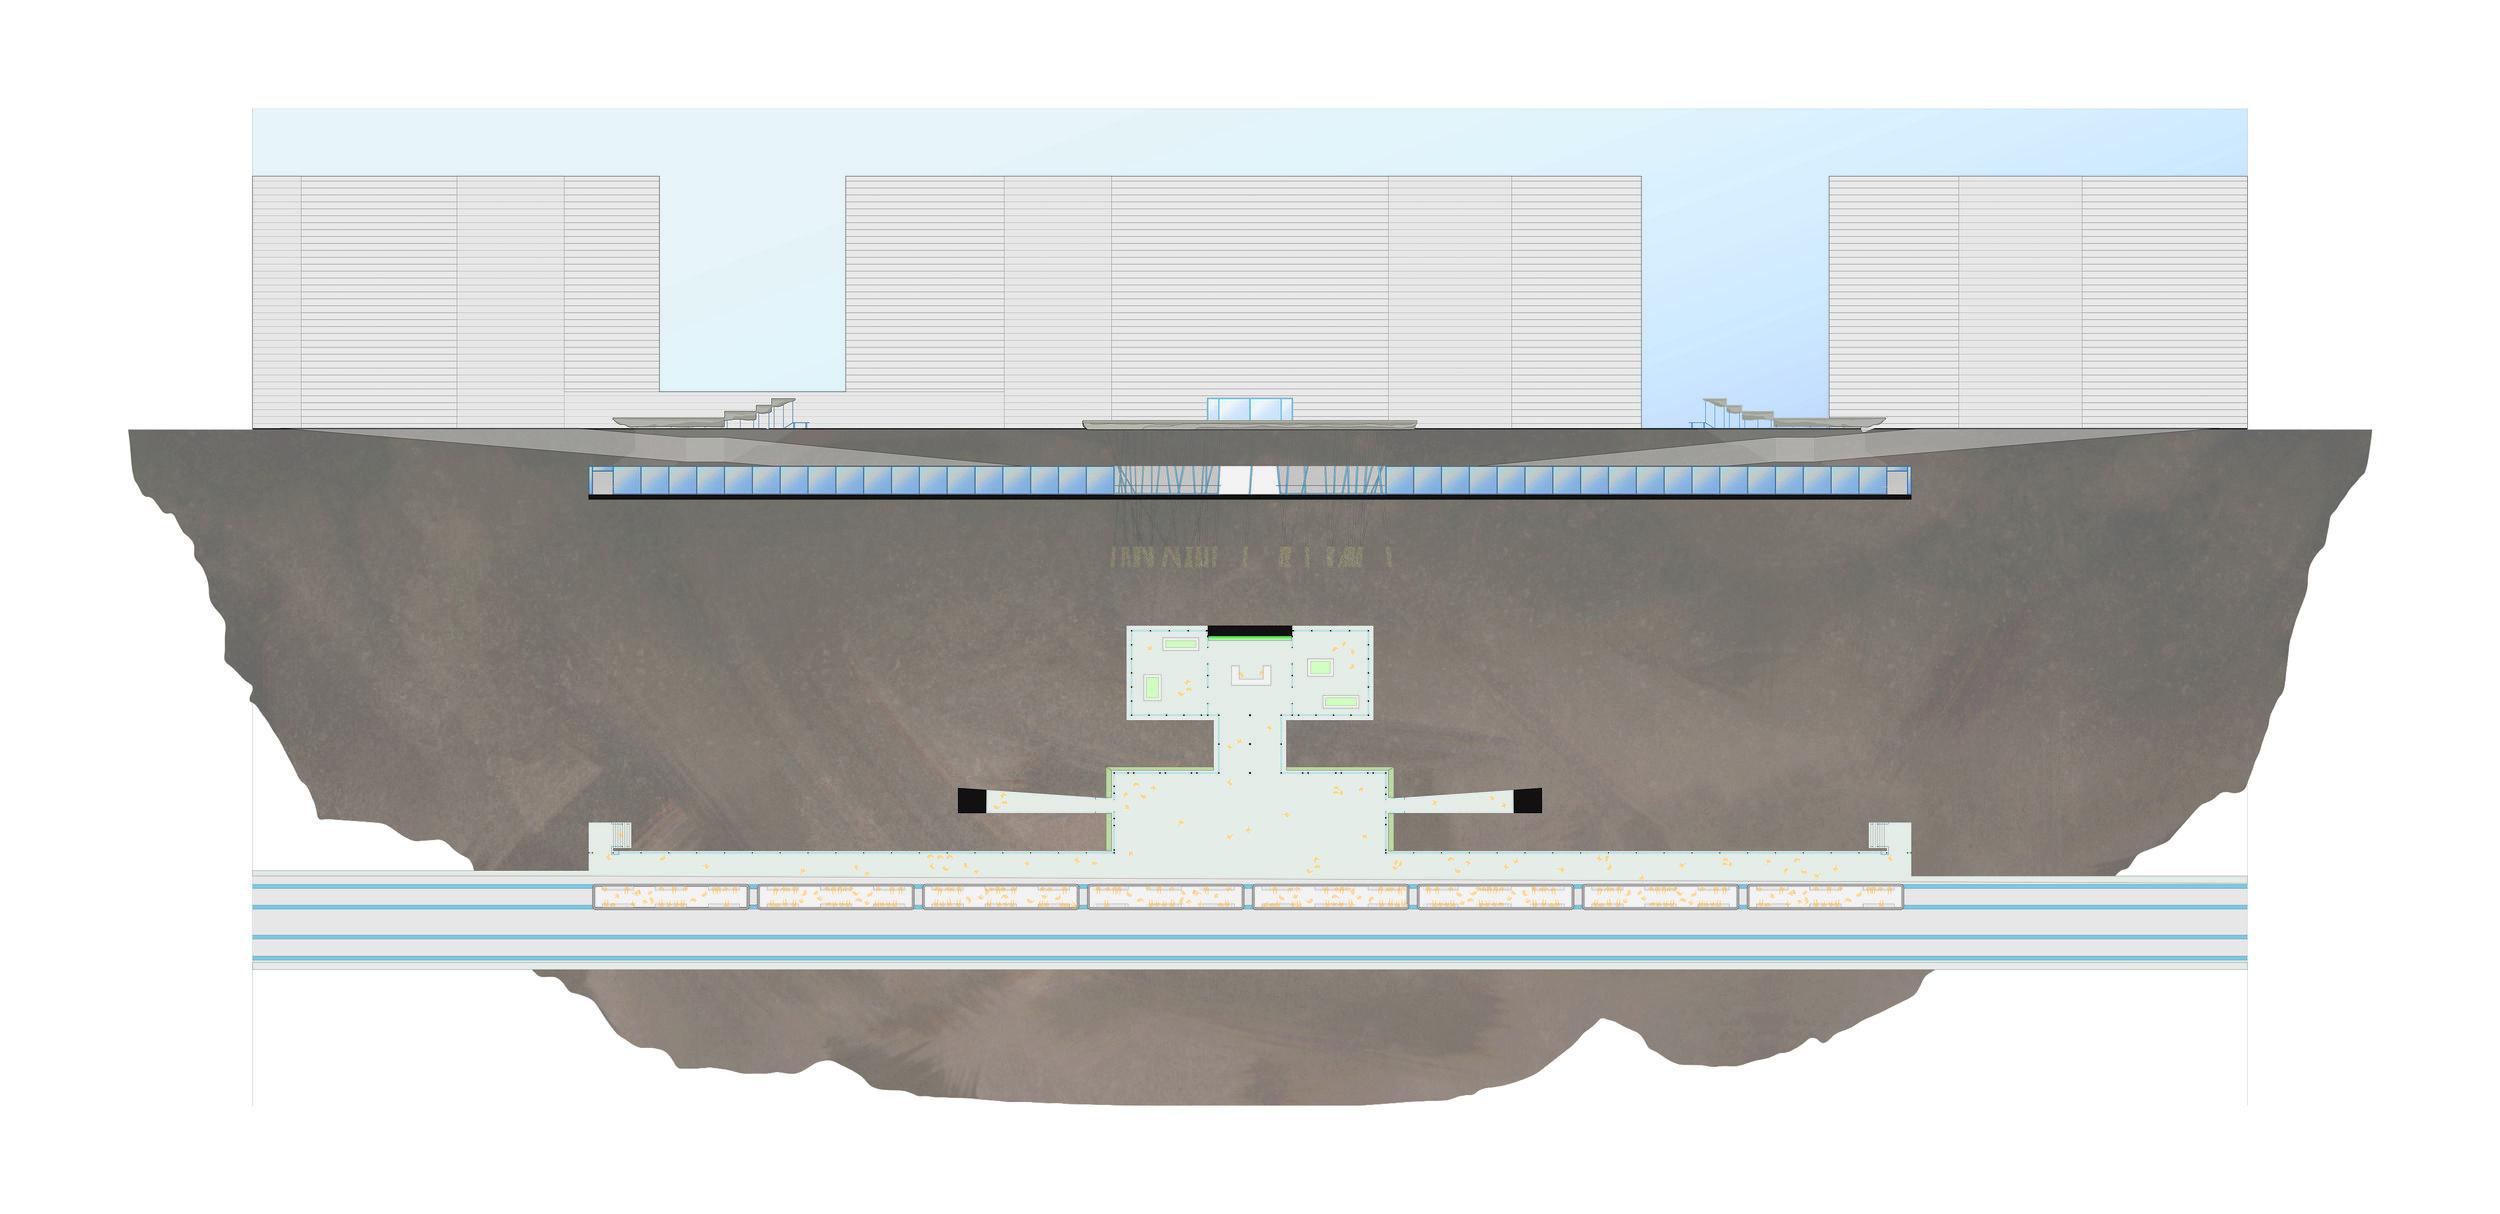 14th St. Subway Station - GSAPP Core I Studio - L-Train, NYC Subway - 14th St., Manhattan, NYinverting urban weight in infrastructure2017